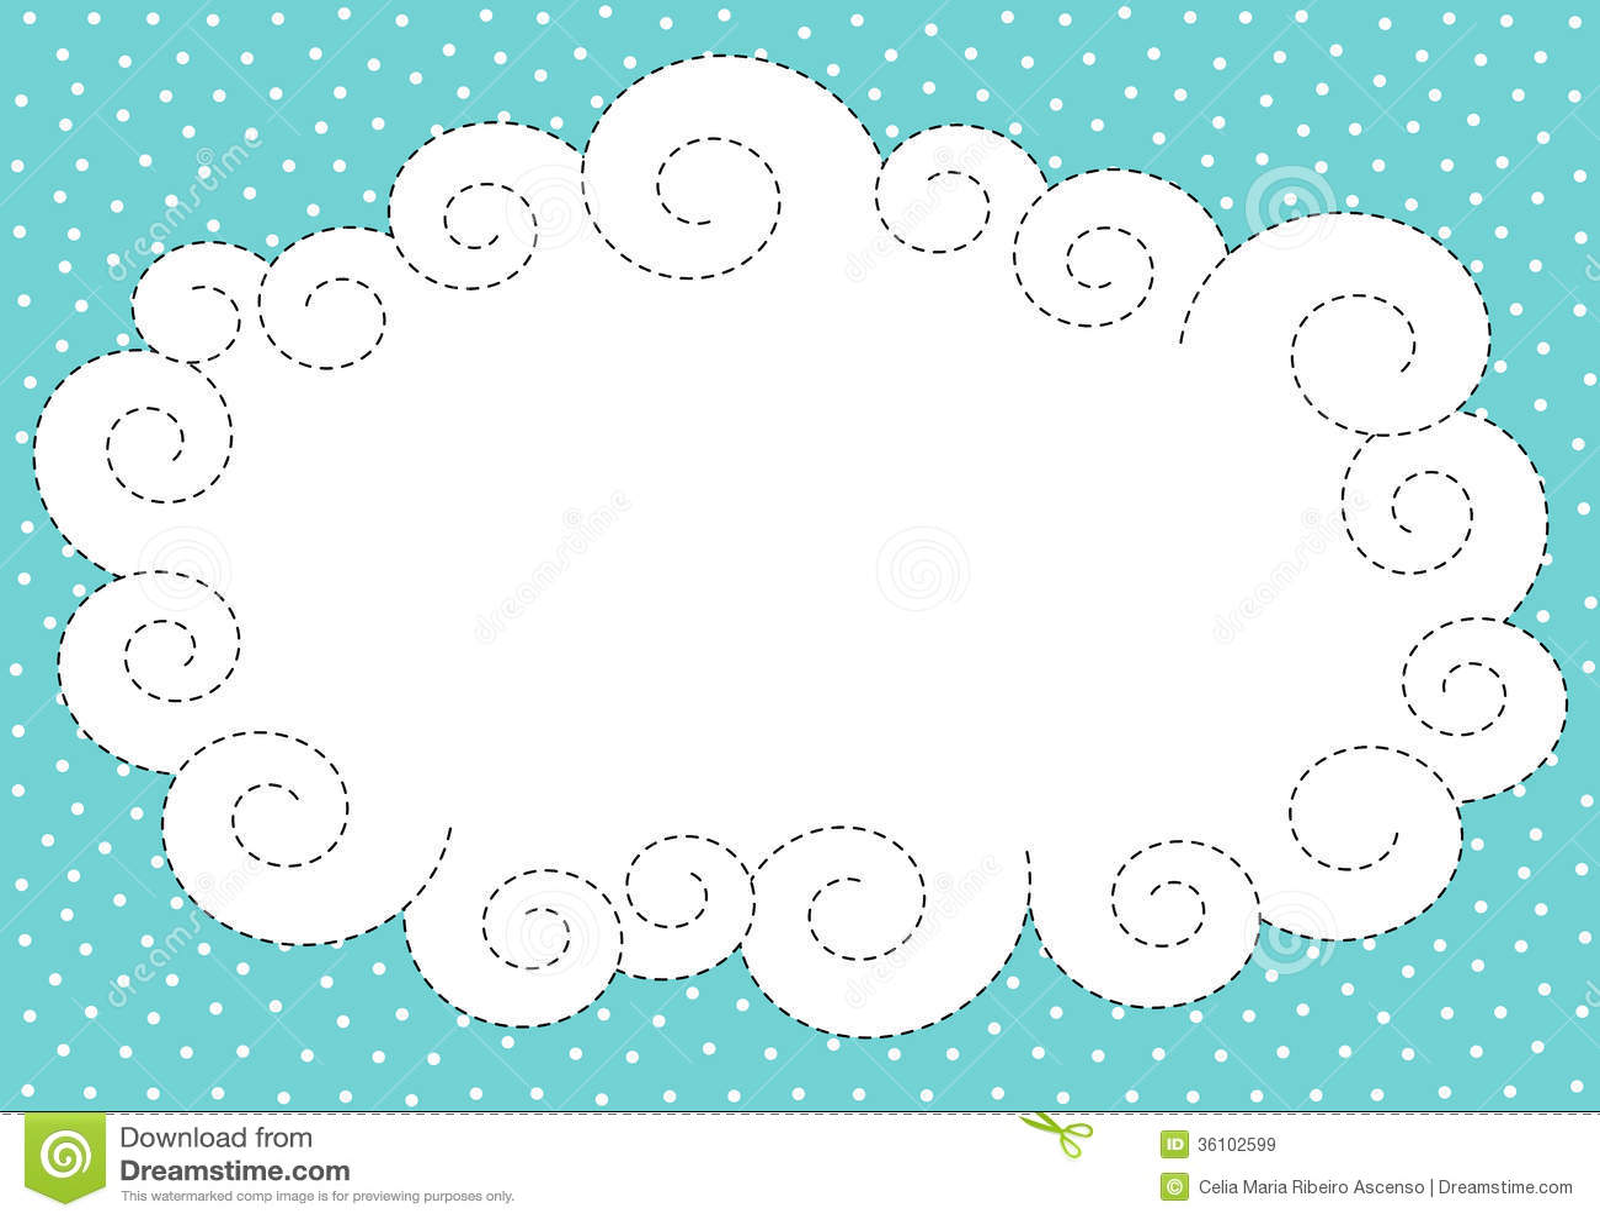 Free Clip Art Snow Borders